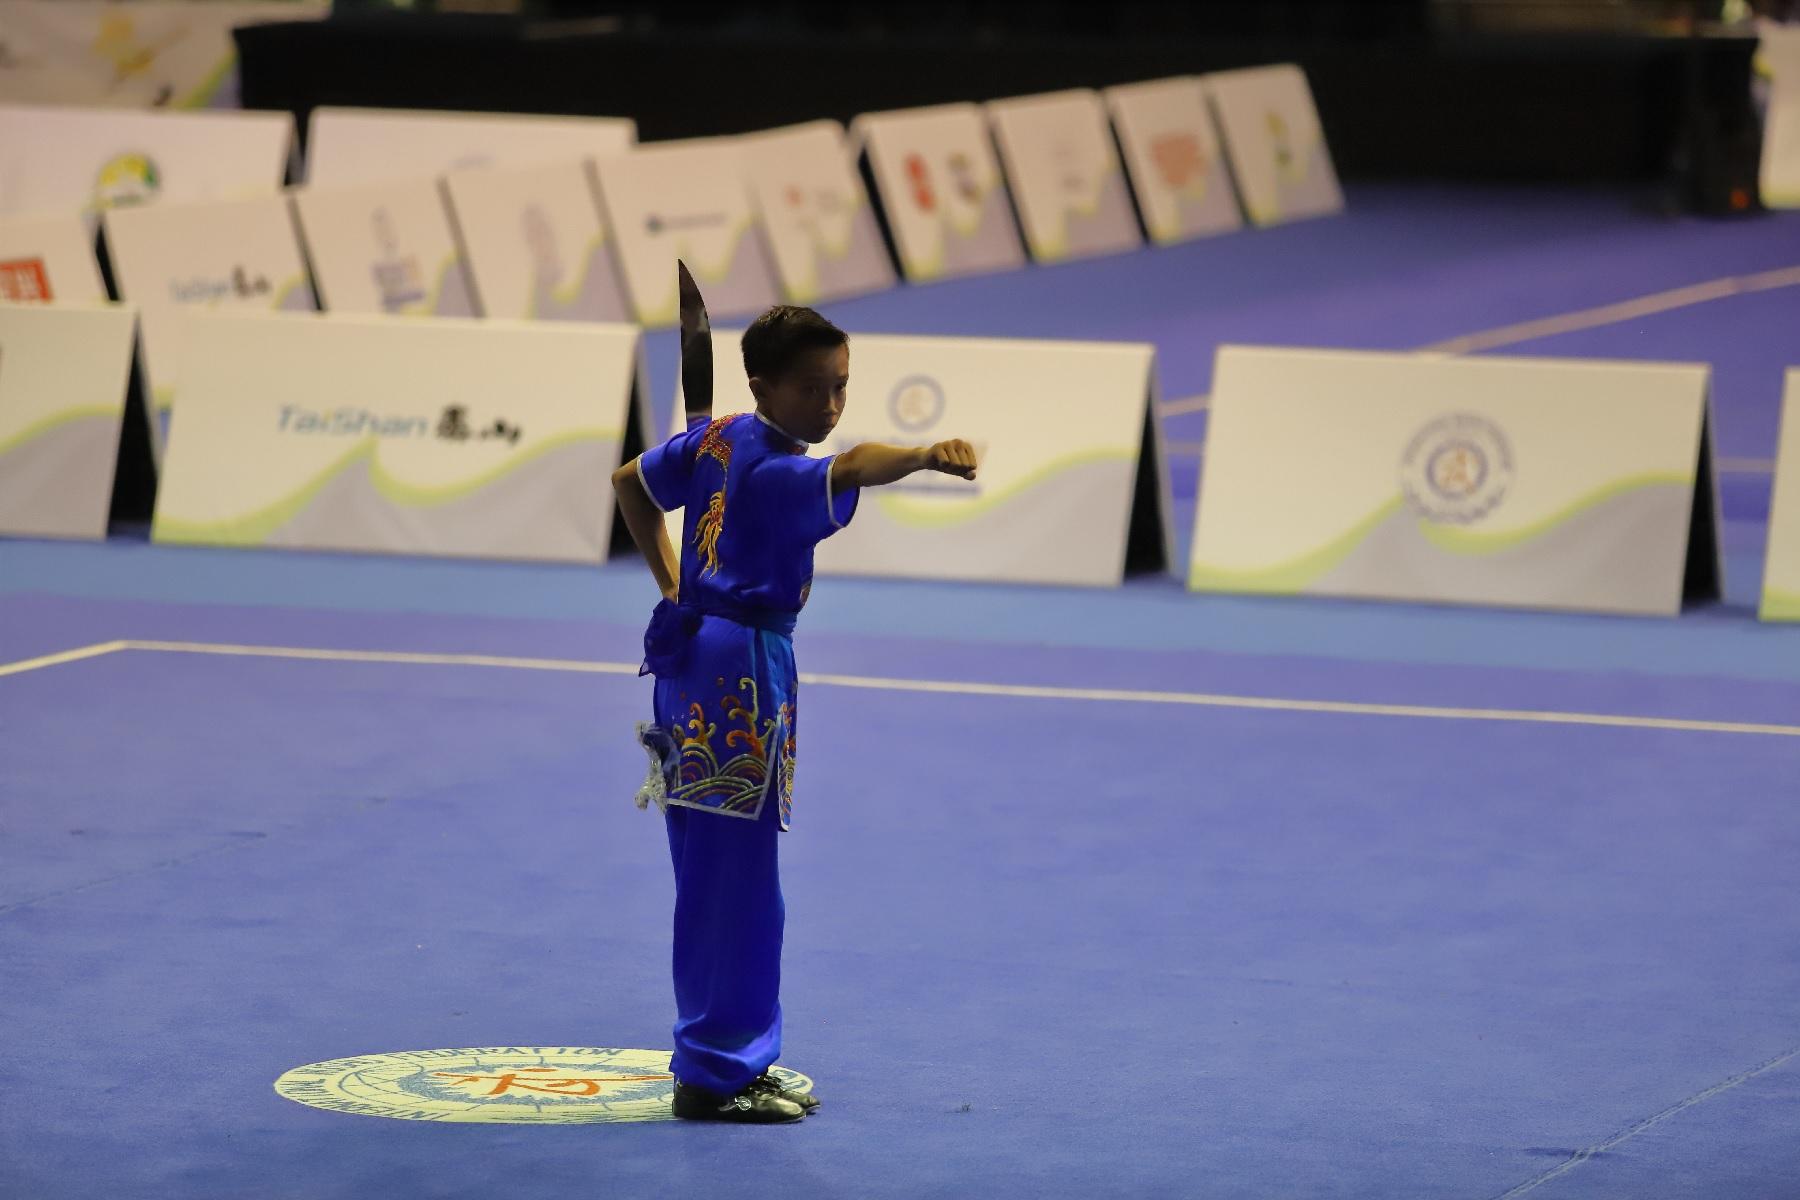 wayland-li-wushu-brazil-world-junior-wushu-championships-2018-team-canada-23.jpg